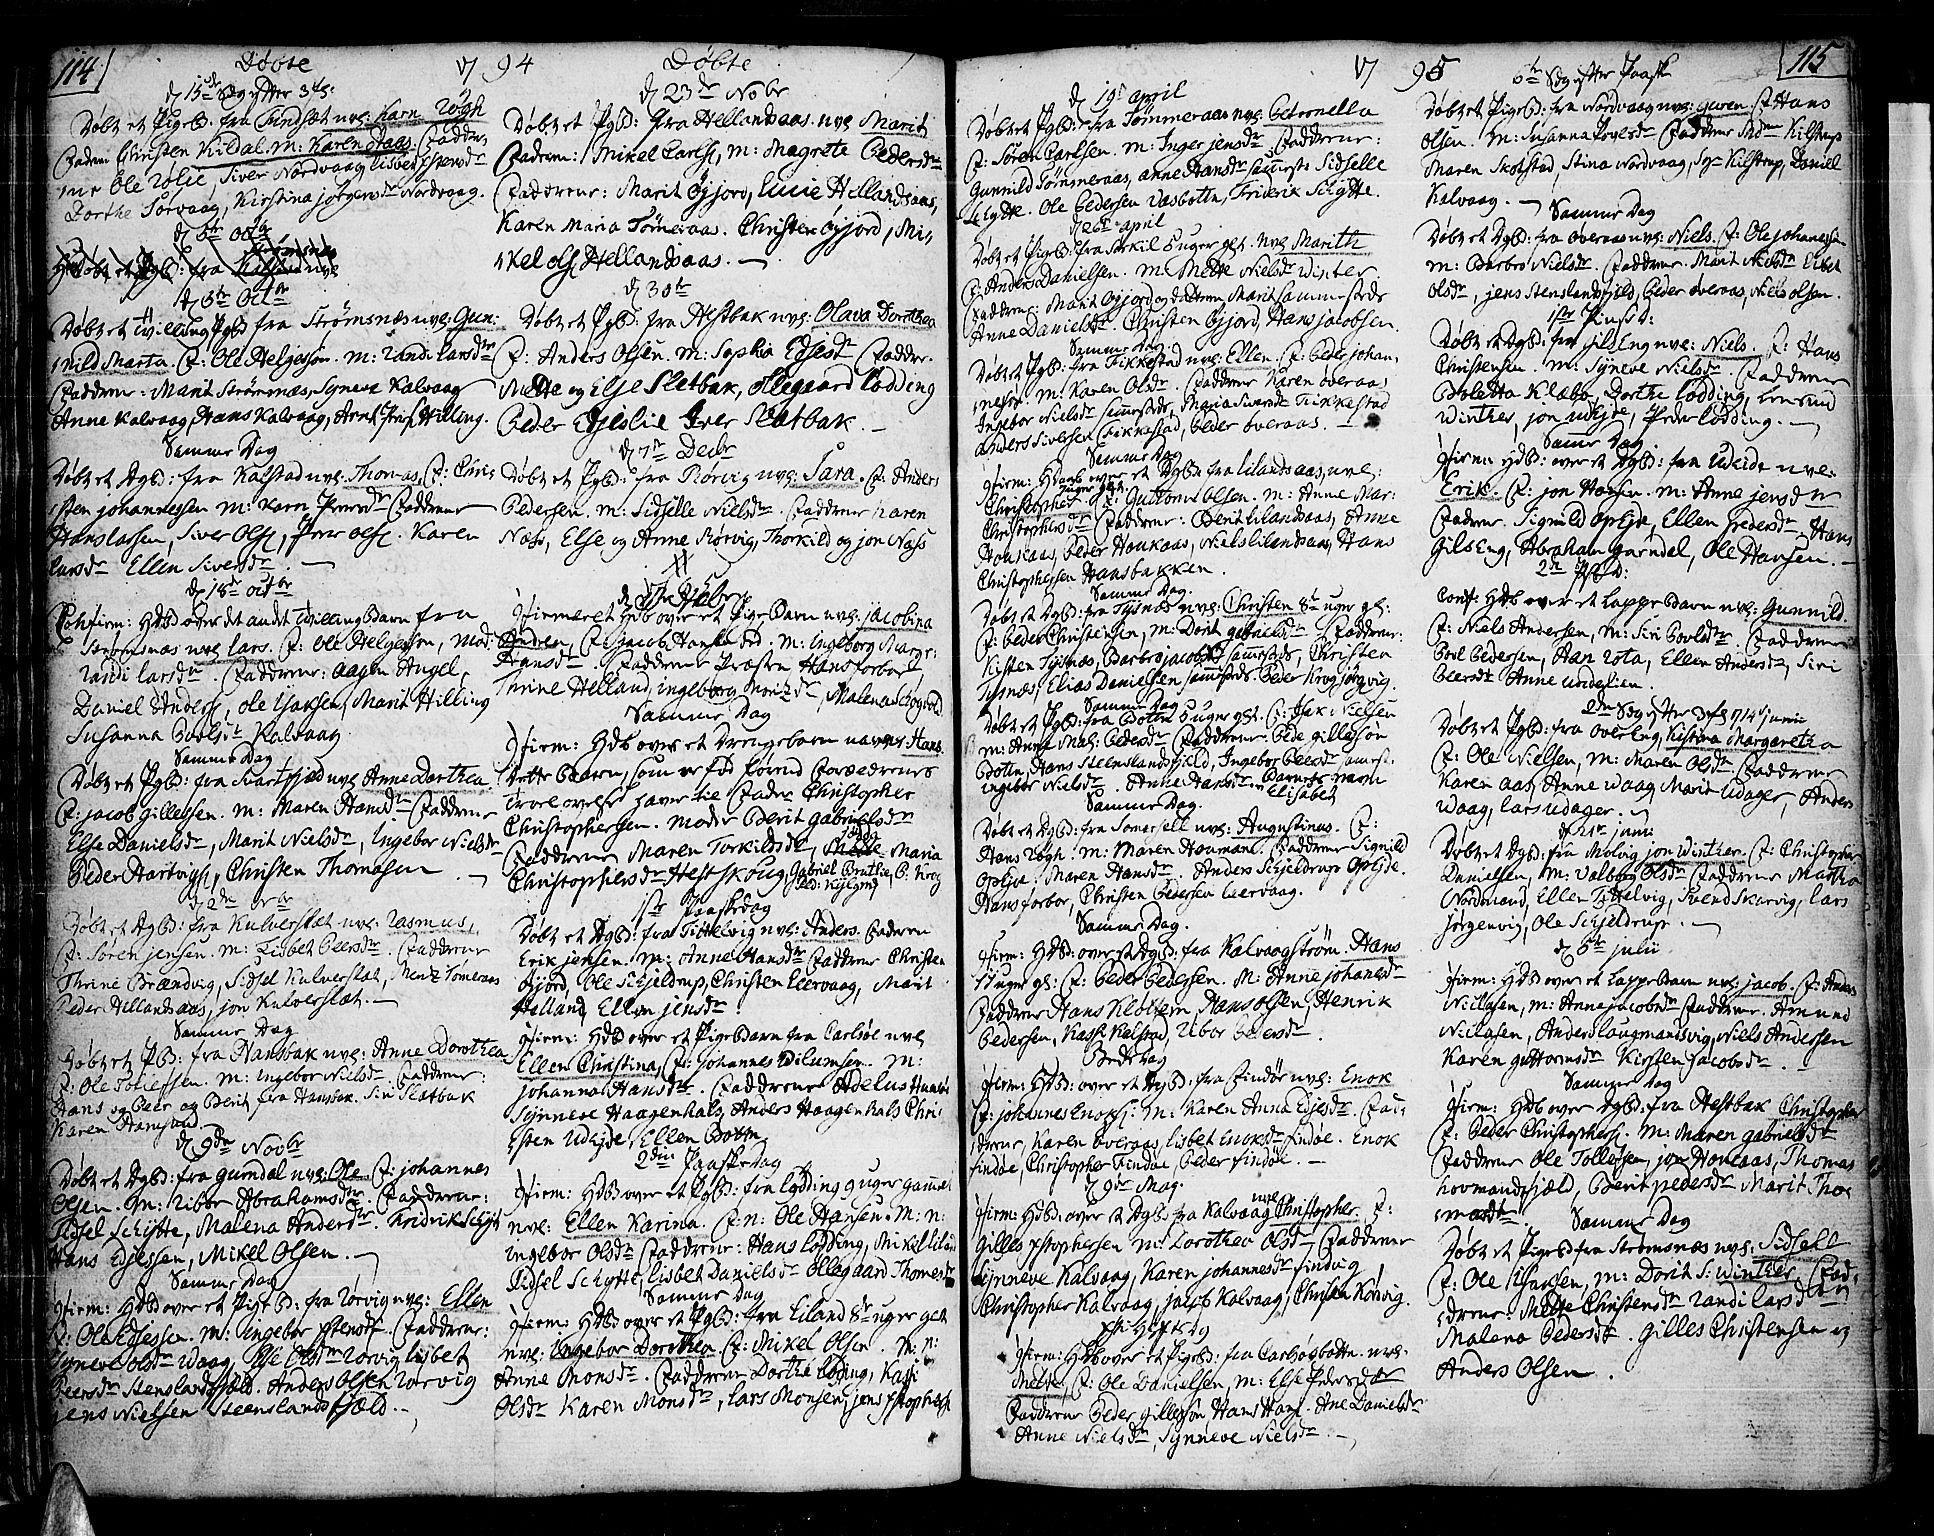 SAT, Ministerialprotokoller, klokkerbøker og fødselsregistre - Nordland, 859/L0841: Ministerialbok nr. 859A01, 1766-1821, s. 114-115